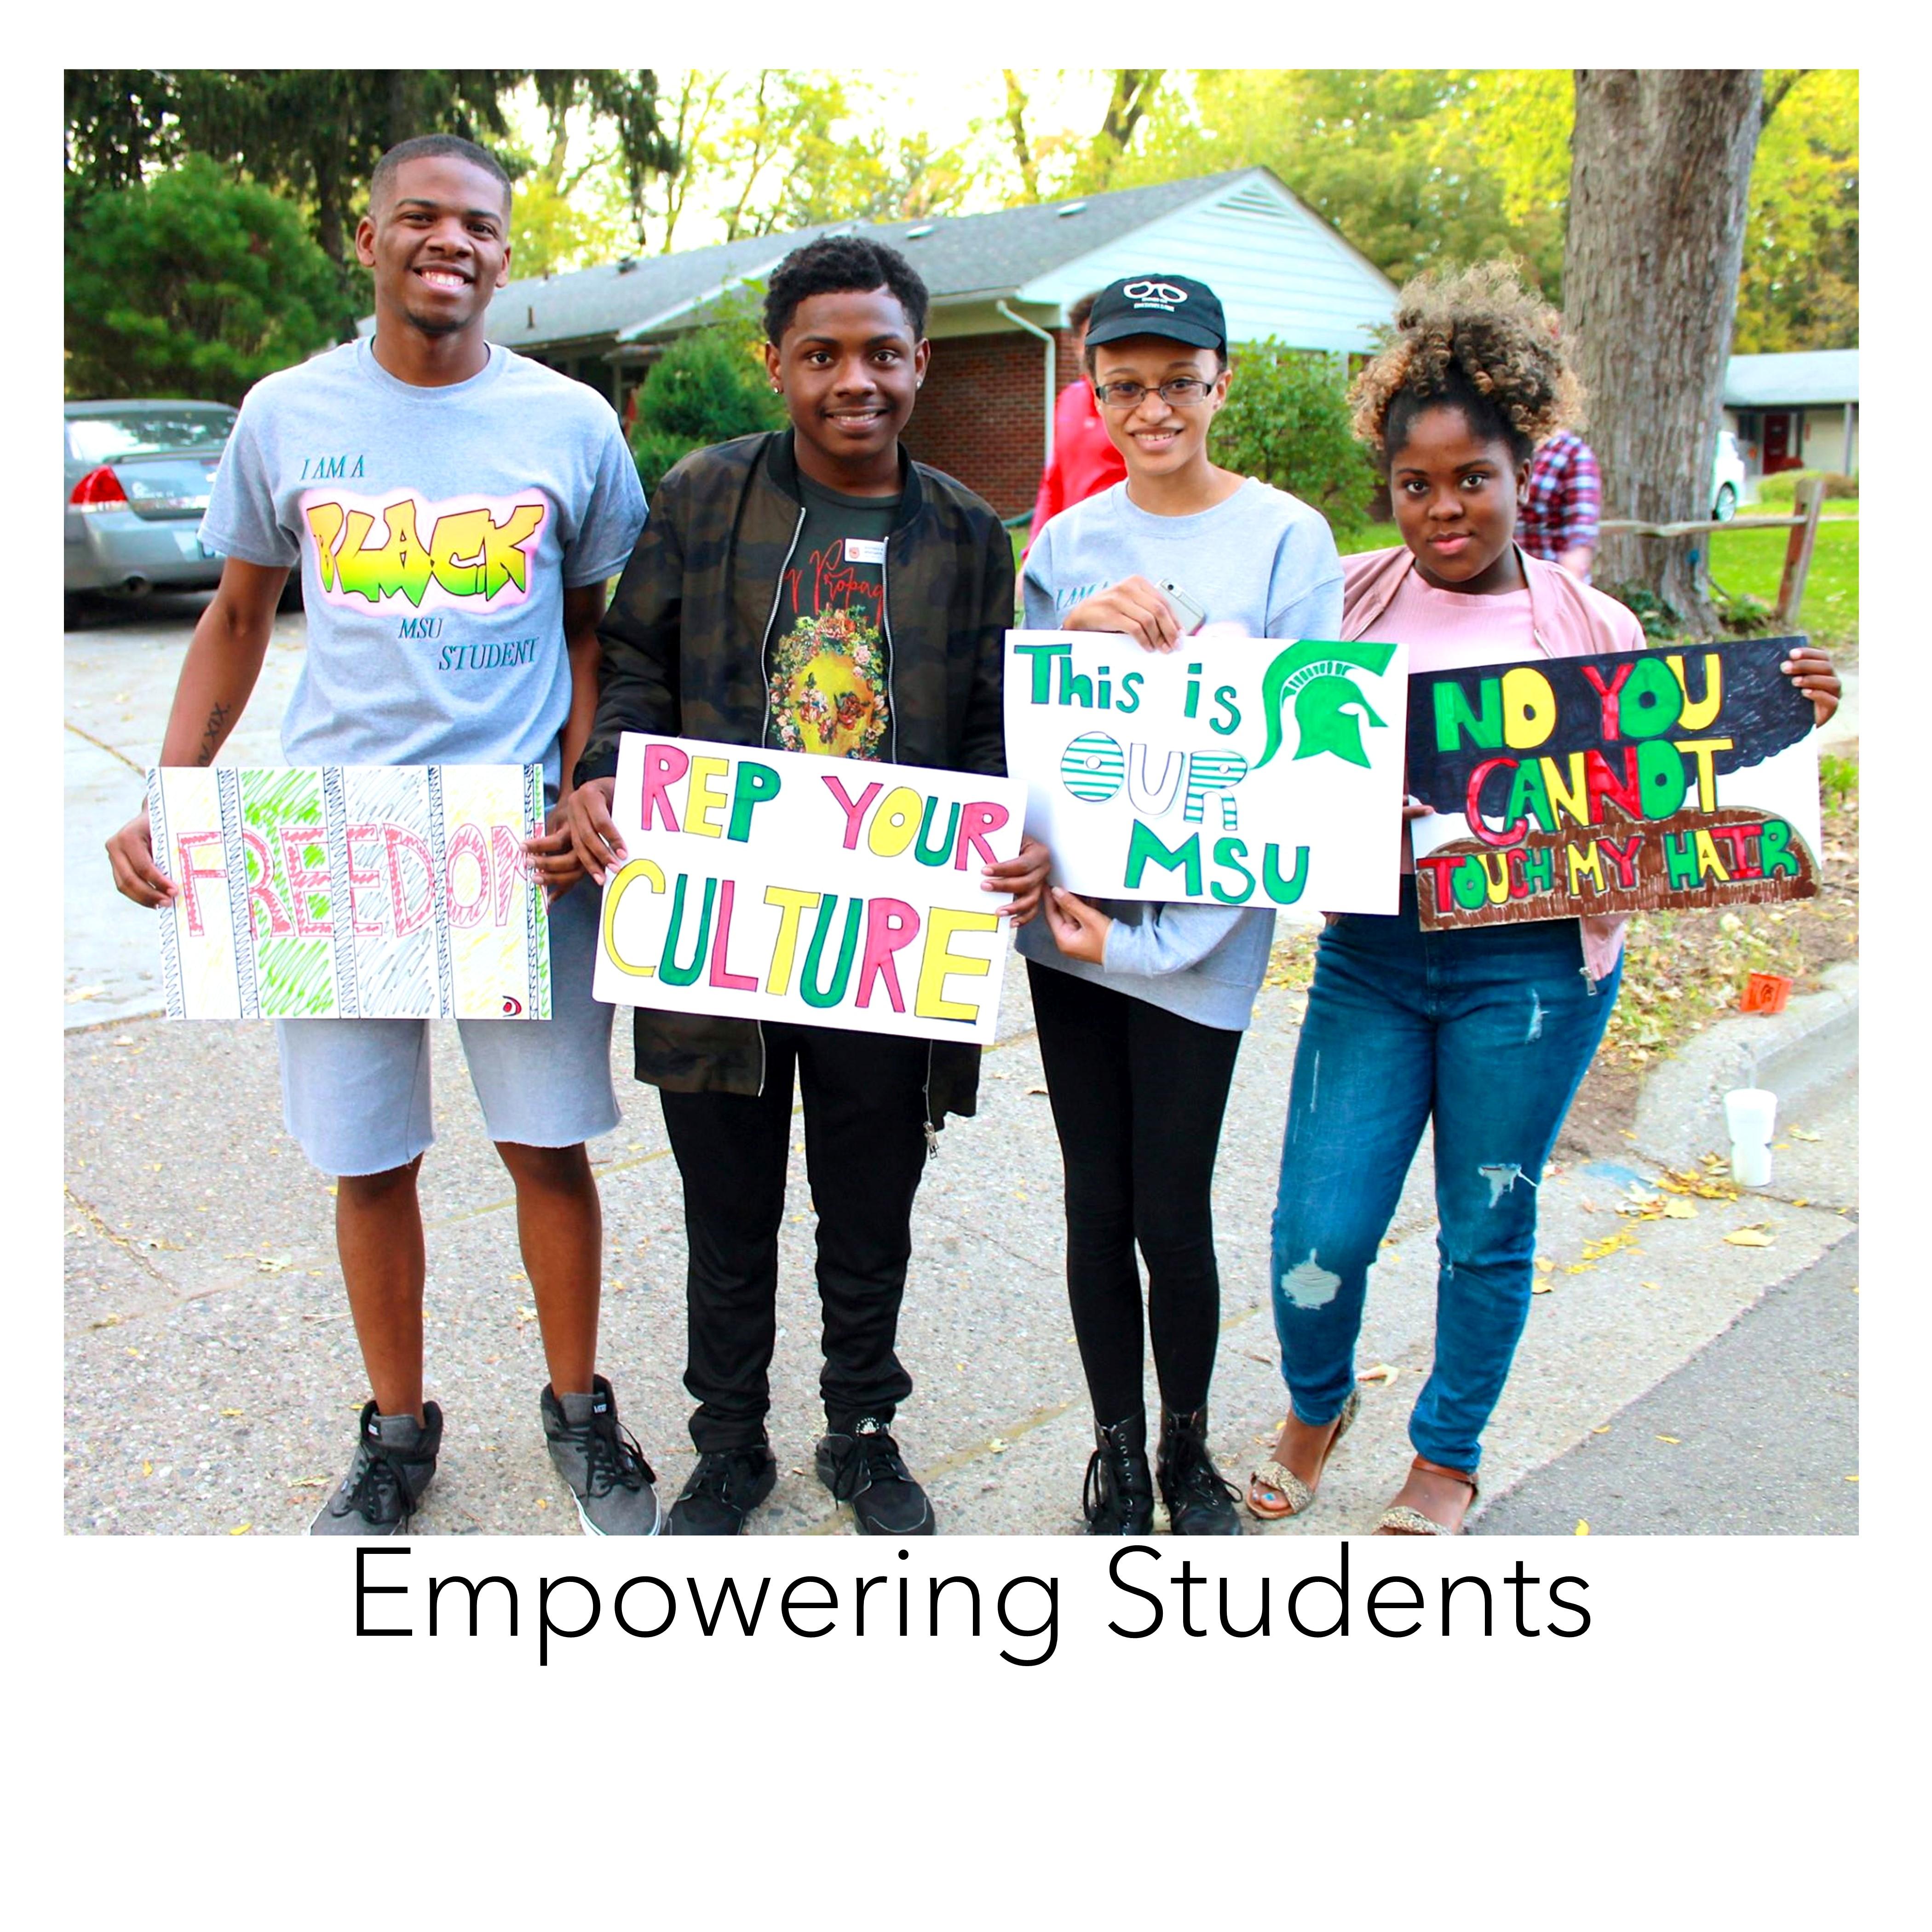 http://ocat.msu.edu/wp-content/uploads/2020/07/Empowering-Students.jpg